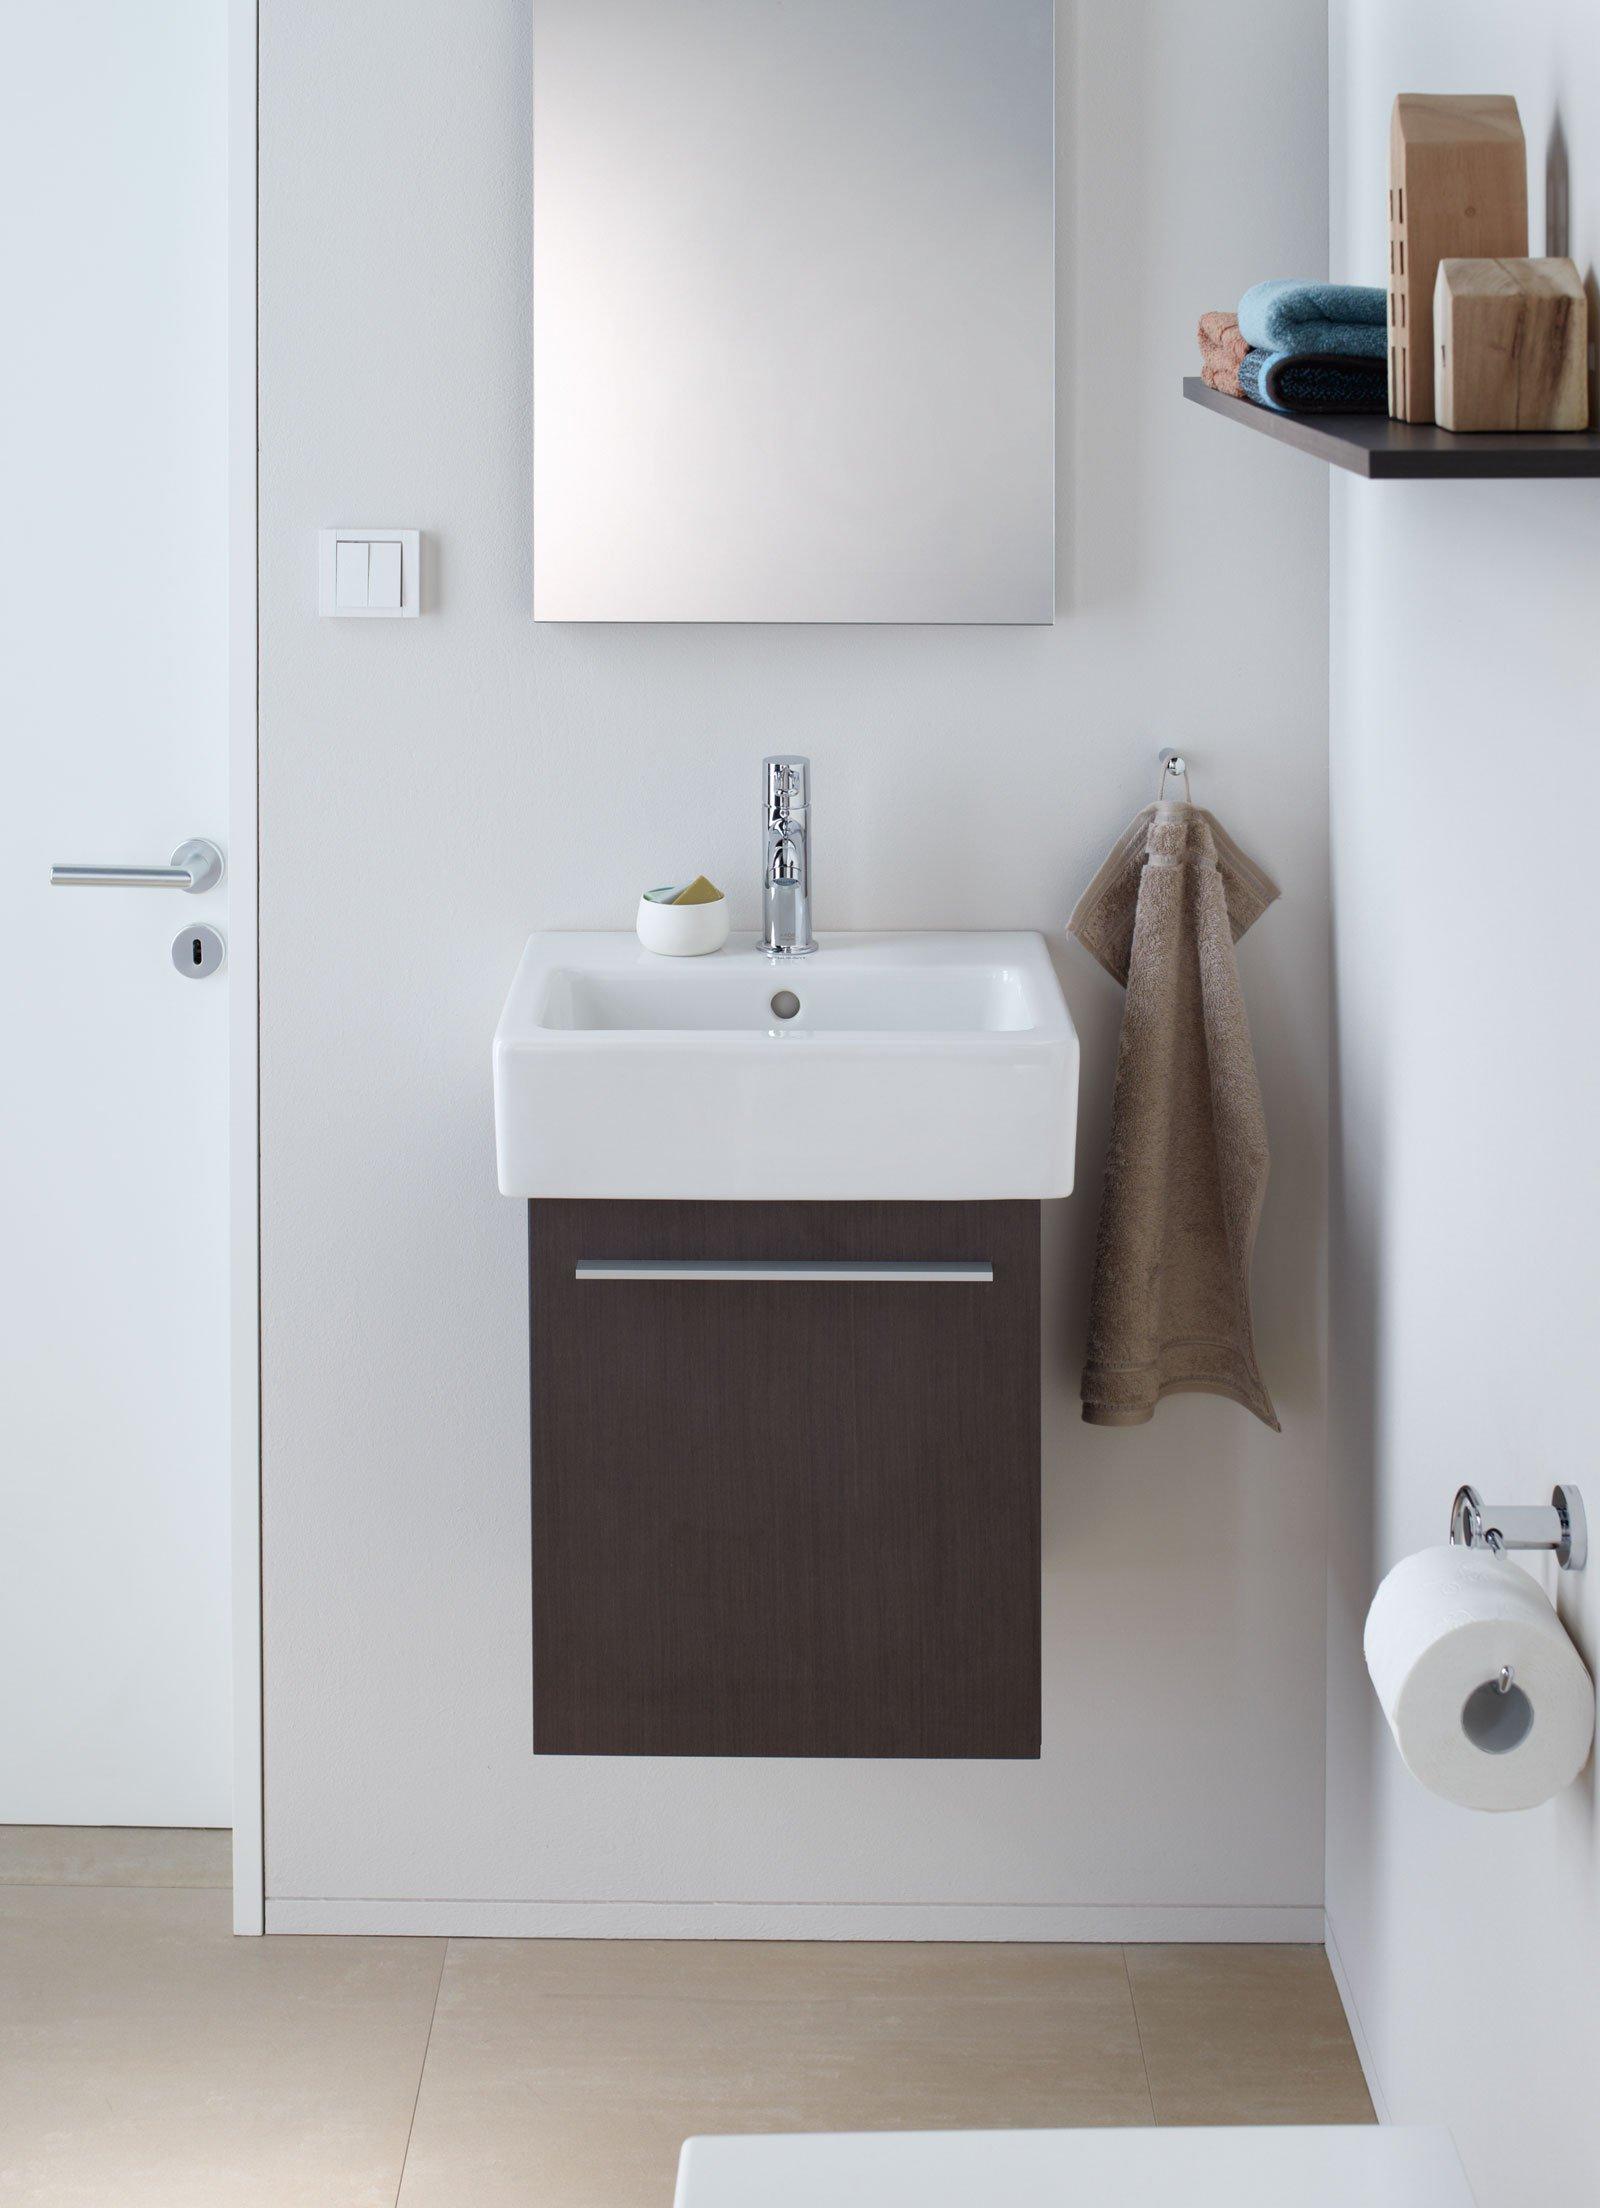 Mobili lavabo piccoli per risparmiare centimetri preziosi for Leroy merlin lavabo bagno